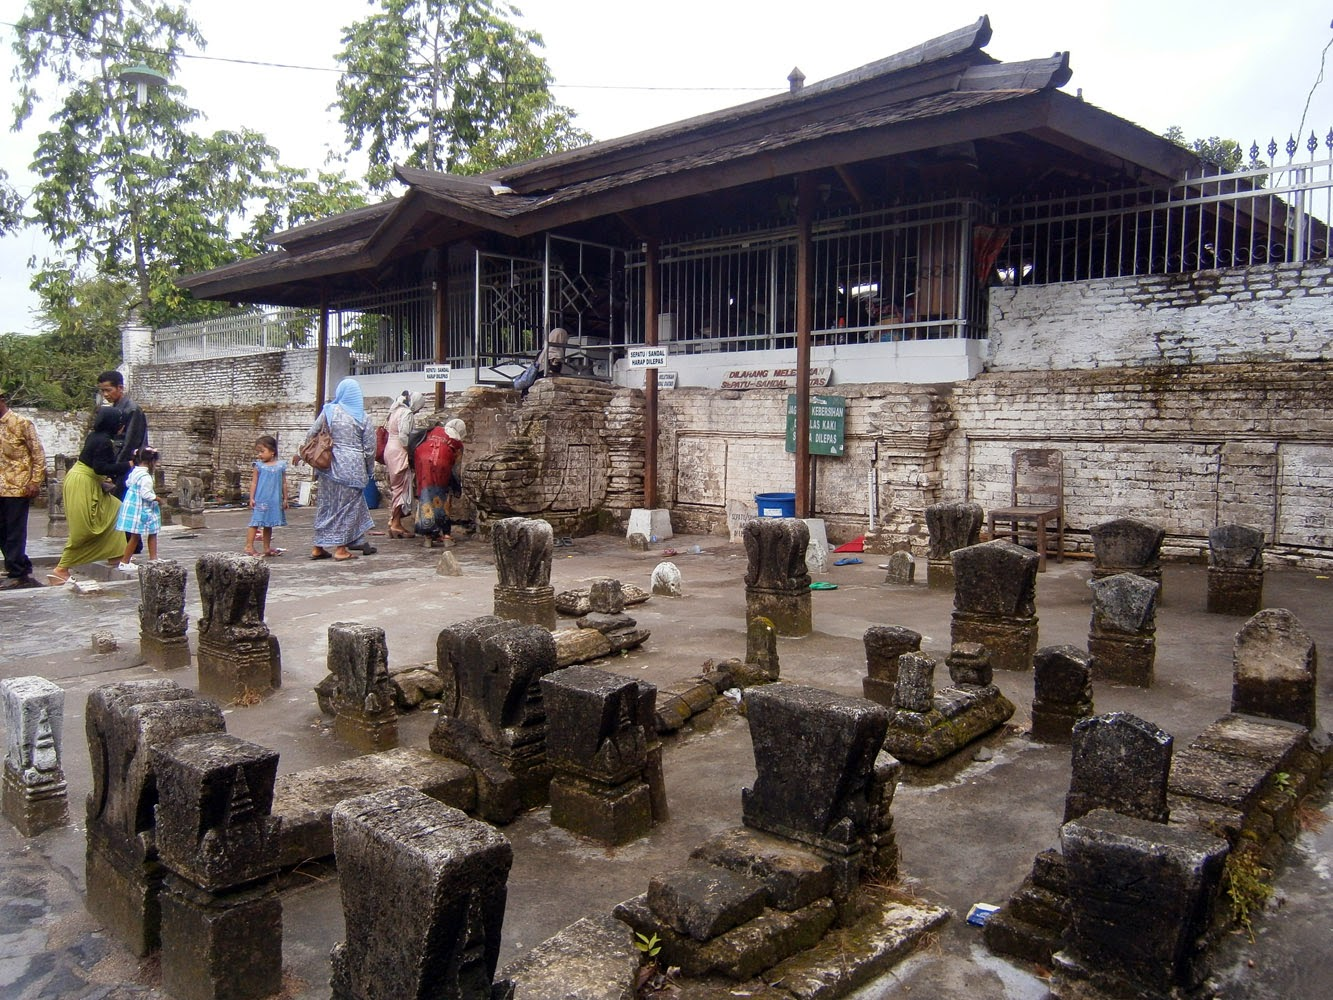 Daftar Tempat Wisata Di Tuban Lamongan Jawa Timur